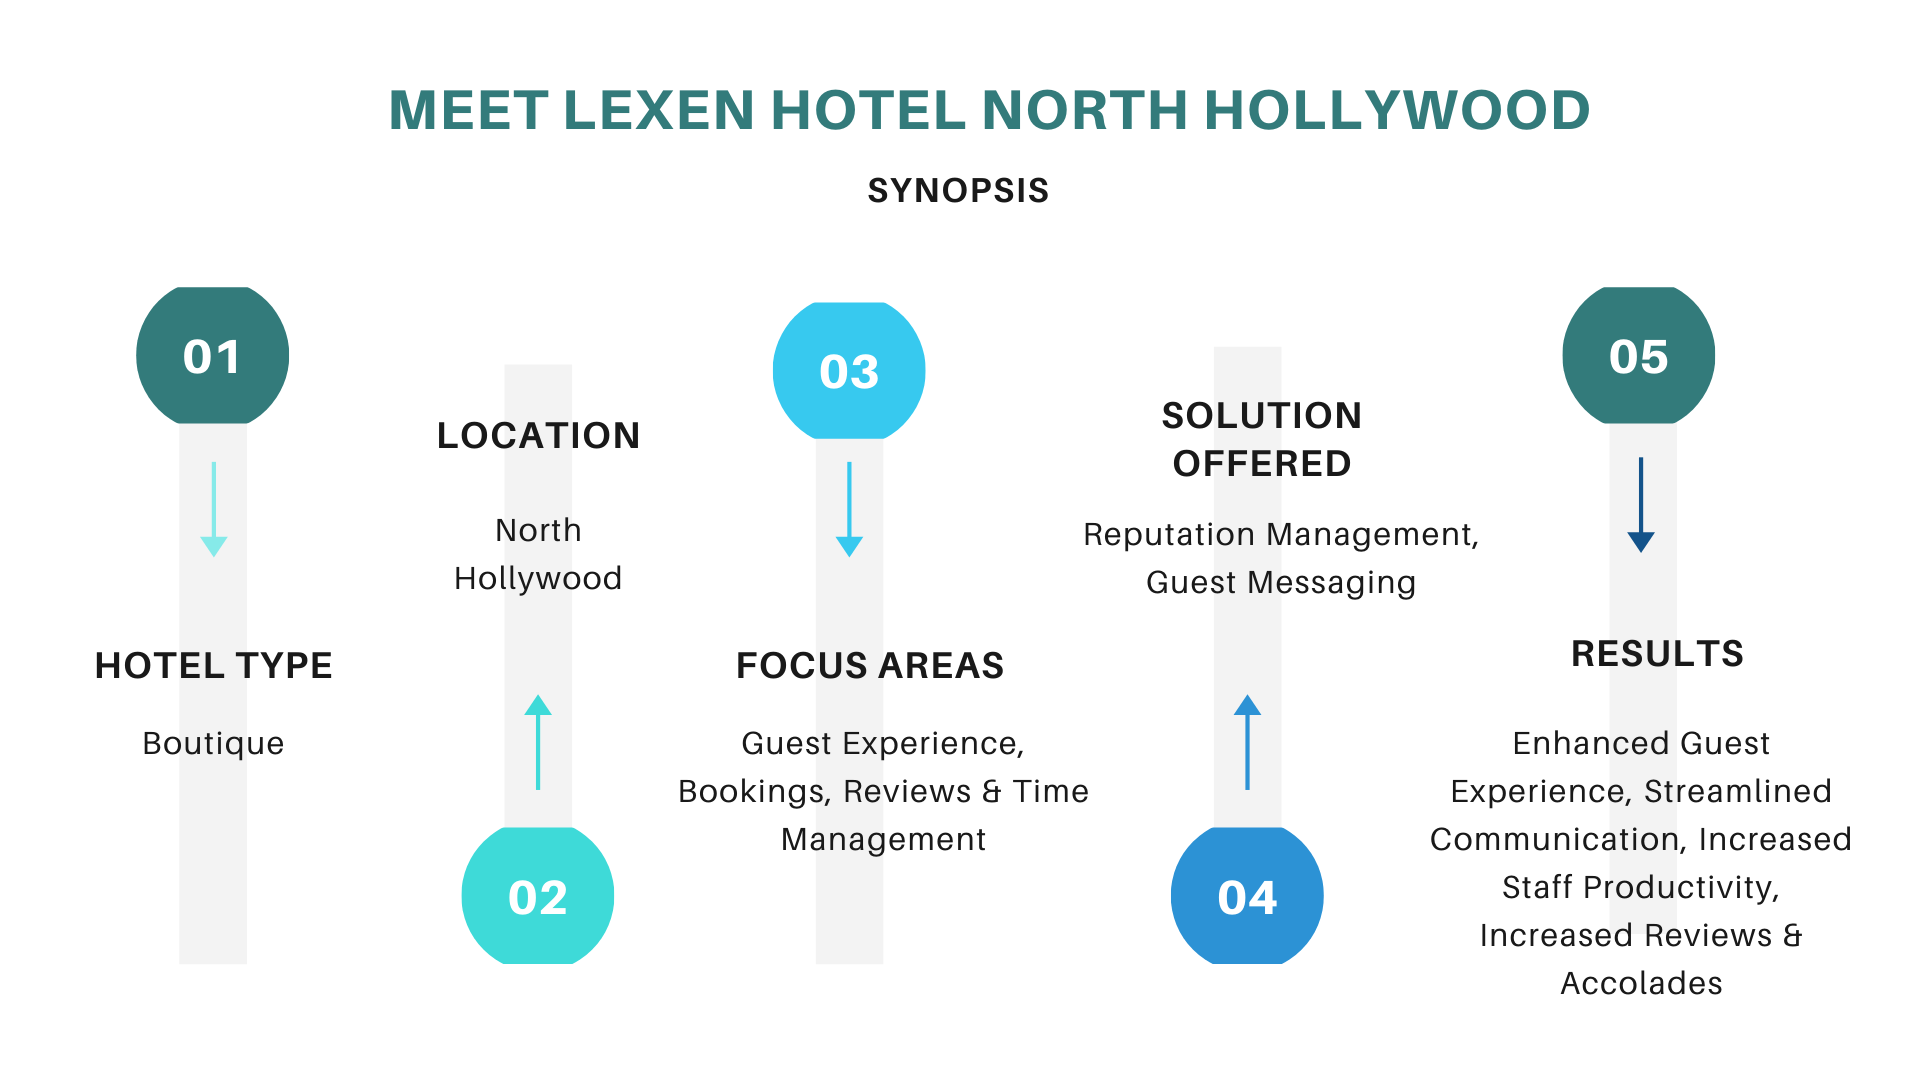 Meet Lexen Hotel North Hollywood